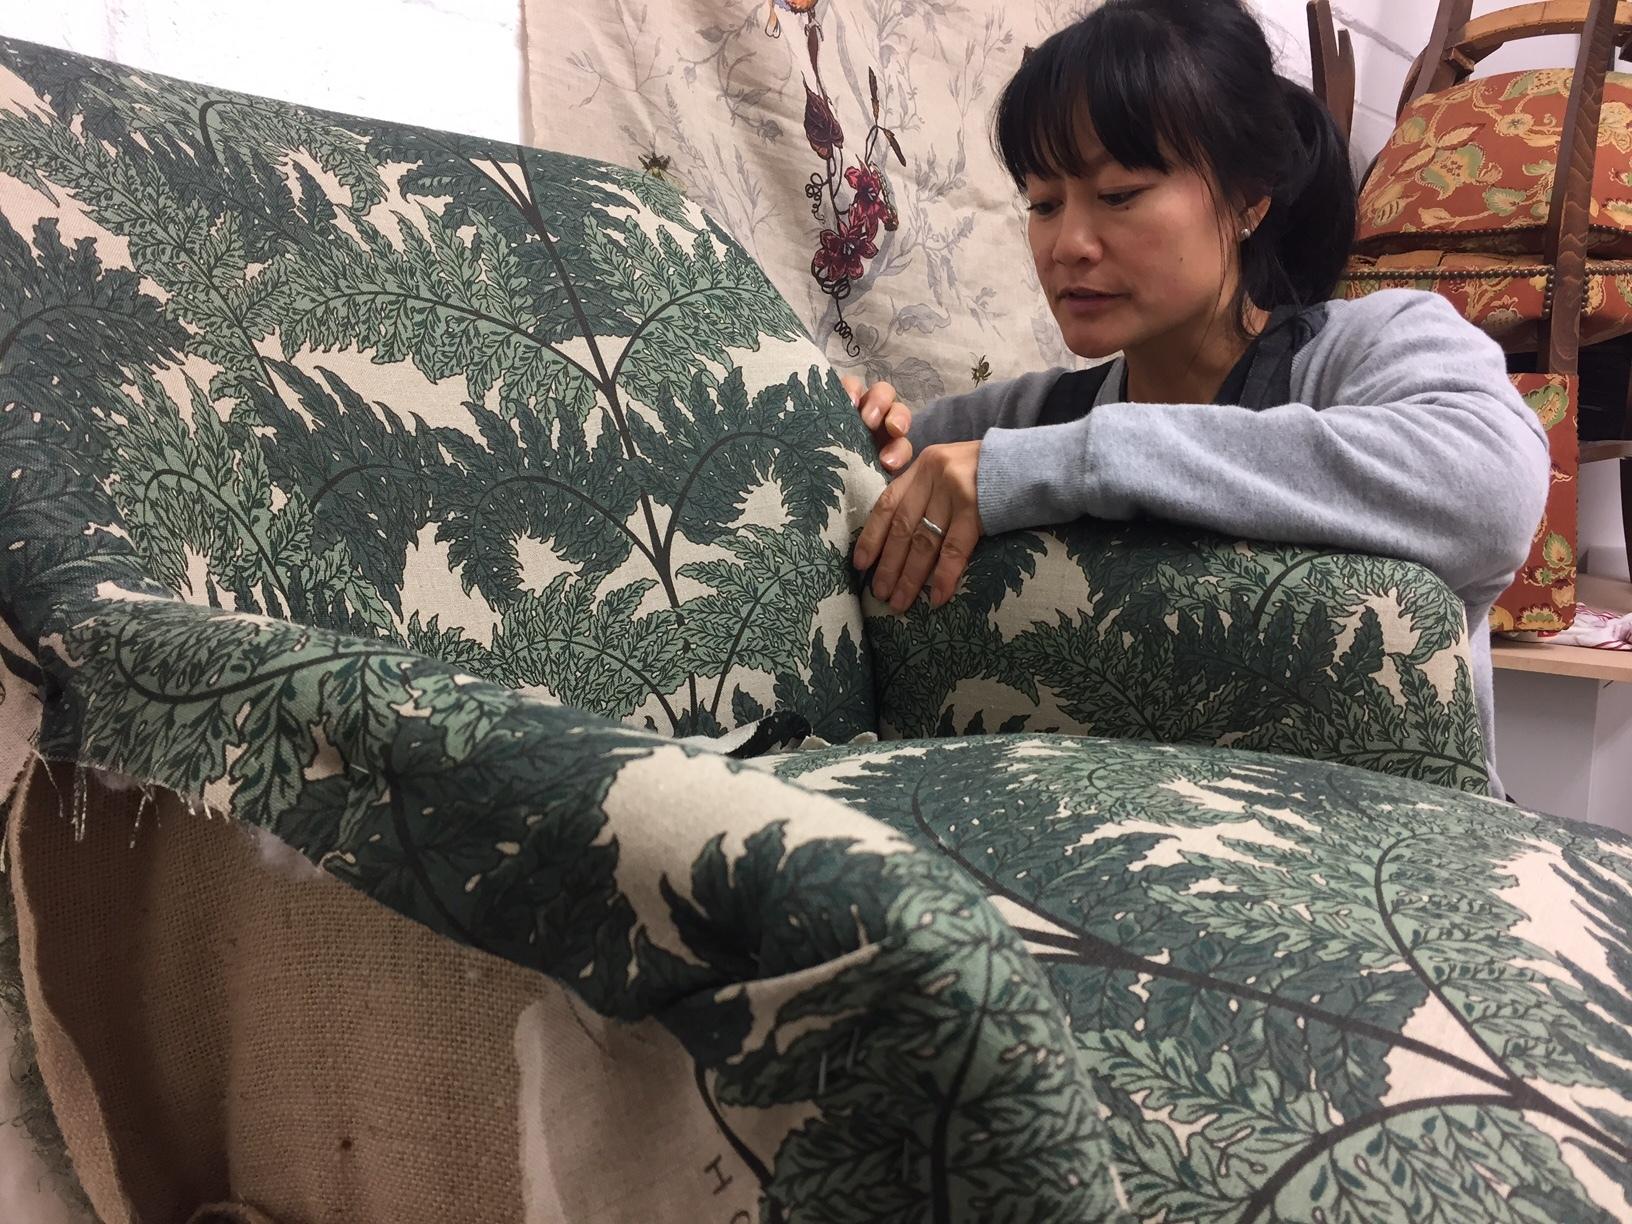 Lisa Yau-Alfredson in her Studio at Thames Side Studios, London